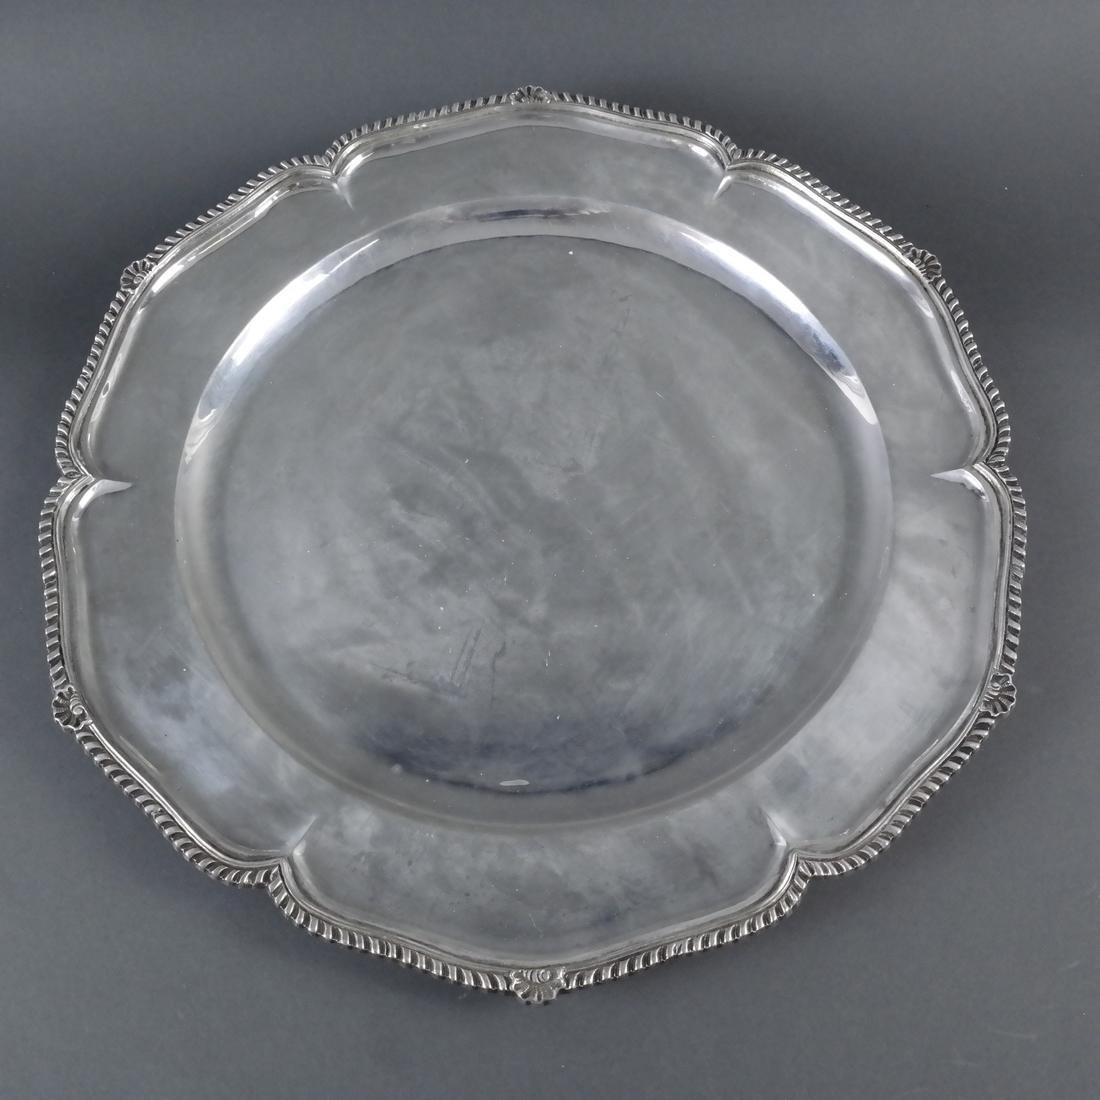 4 .900 Standard Silver Graduated Platters - 4